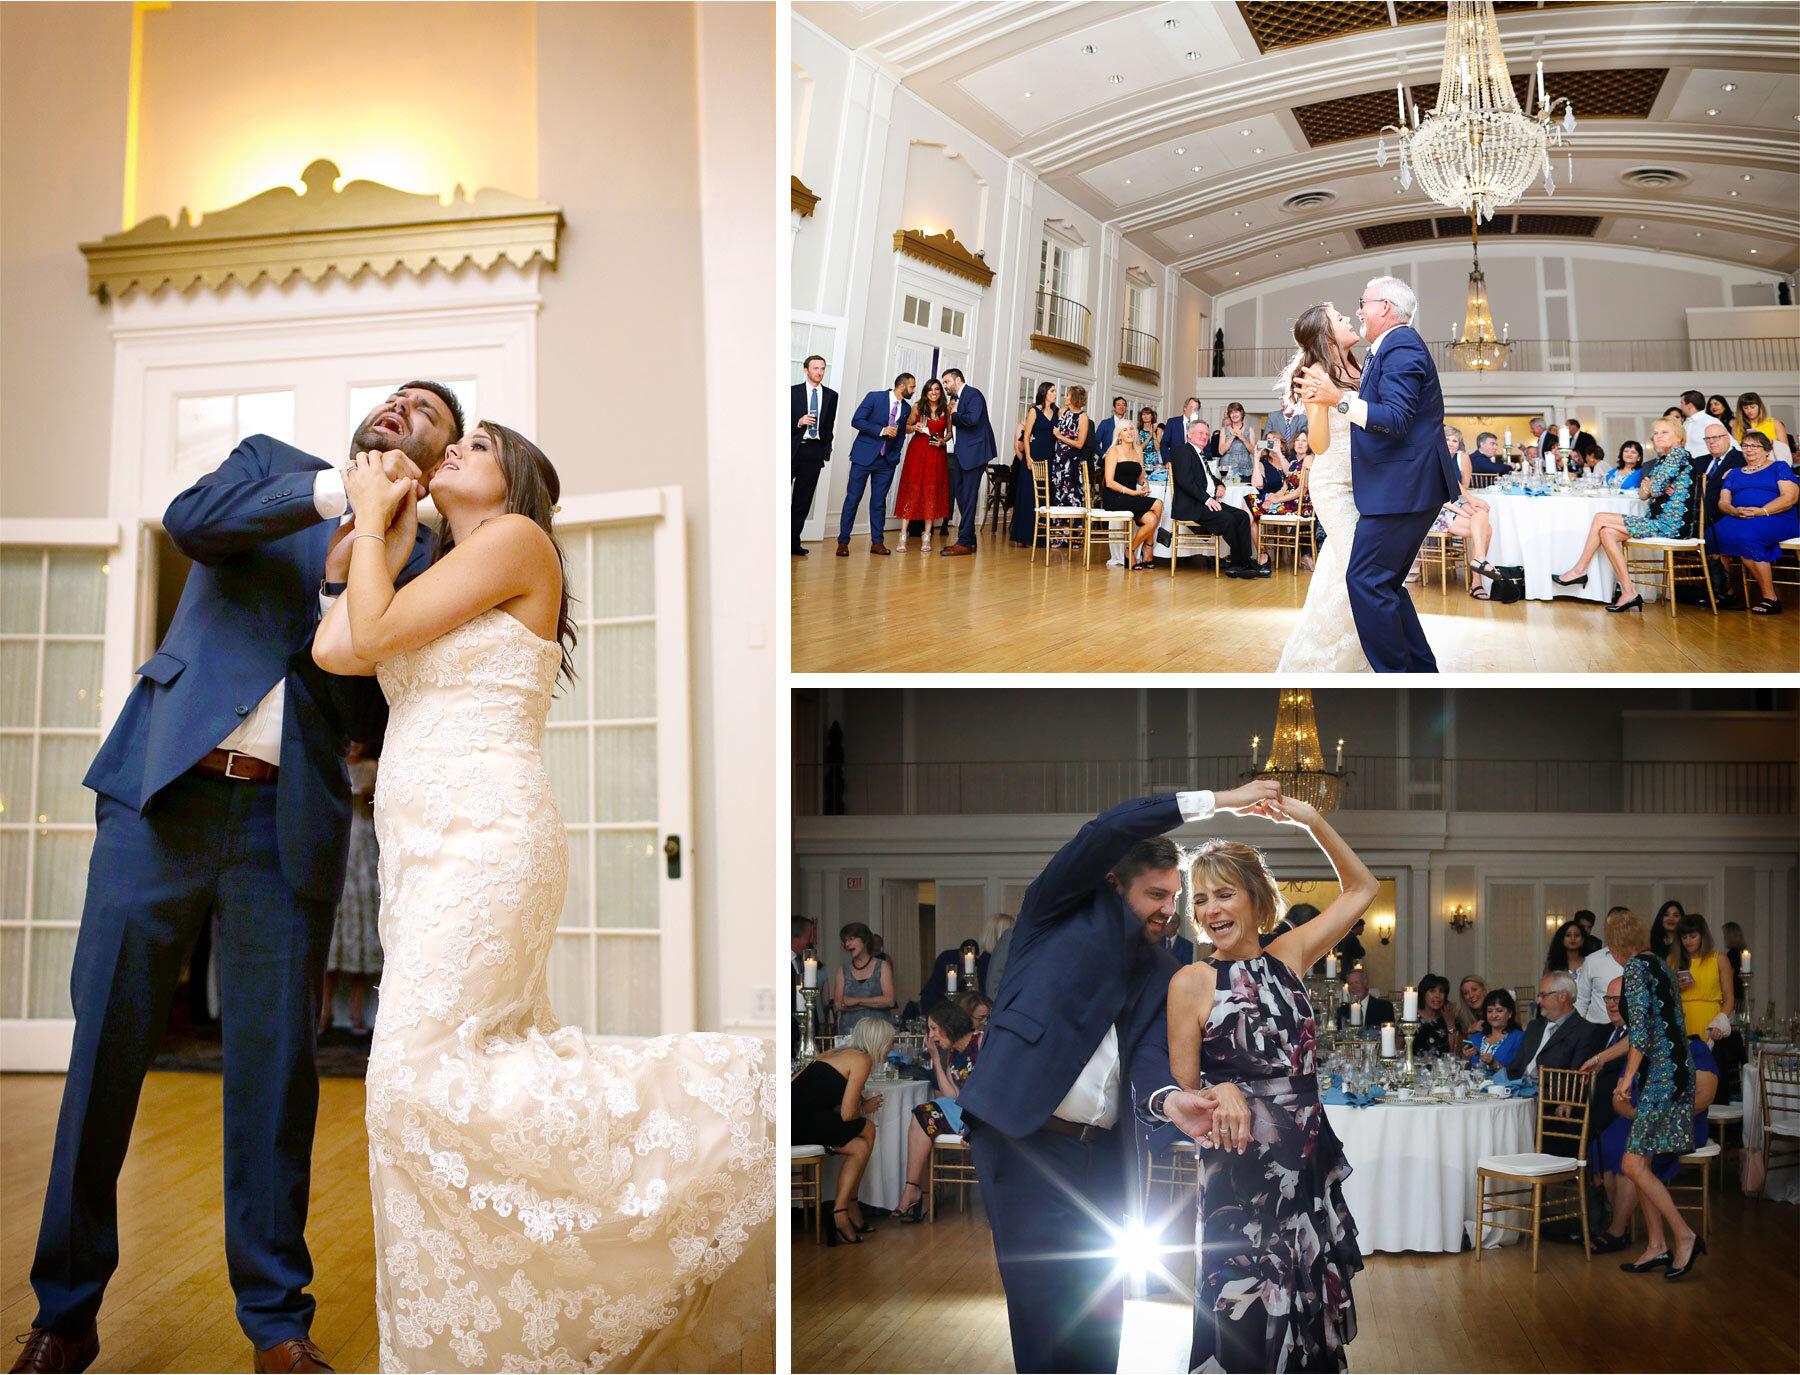 20-Vick-Photography-Wedding-Minnetonka-Minnesota-Lafayette-Club-Reception-First-Dance-Mother-Father-Katie-and-David.jpg